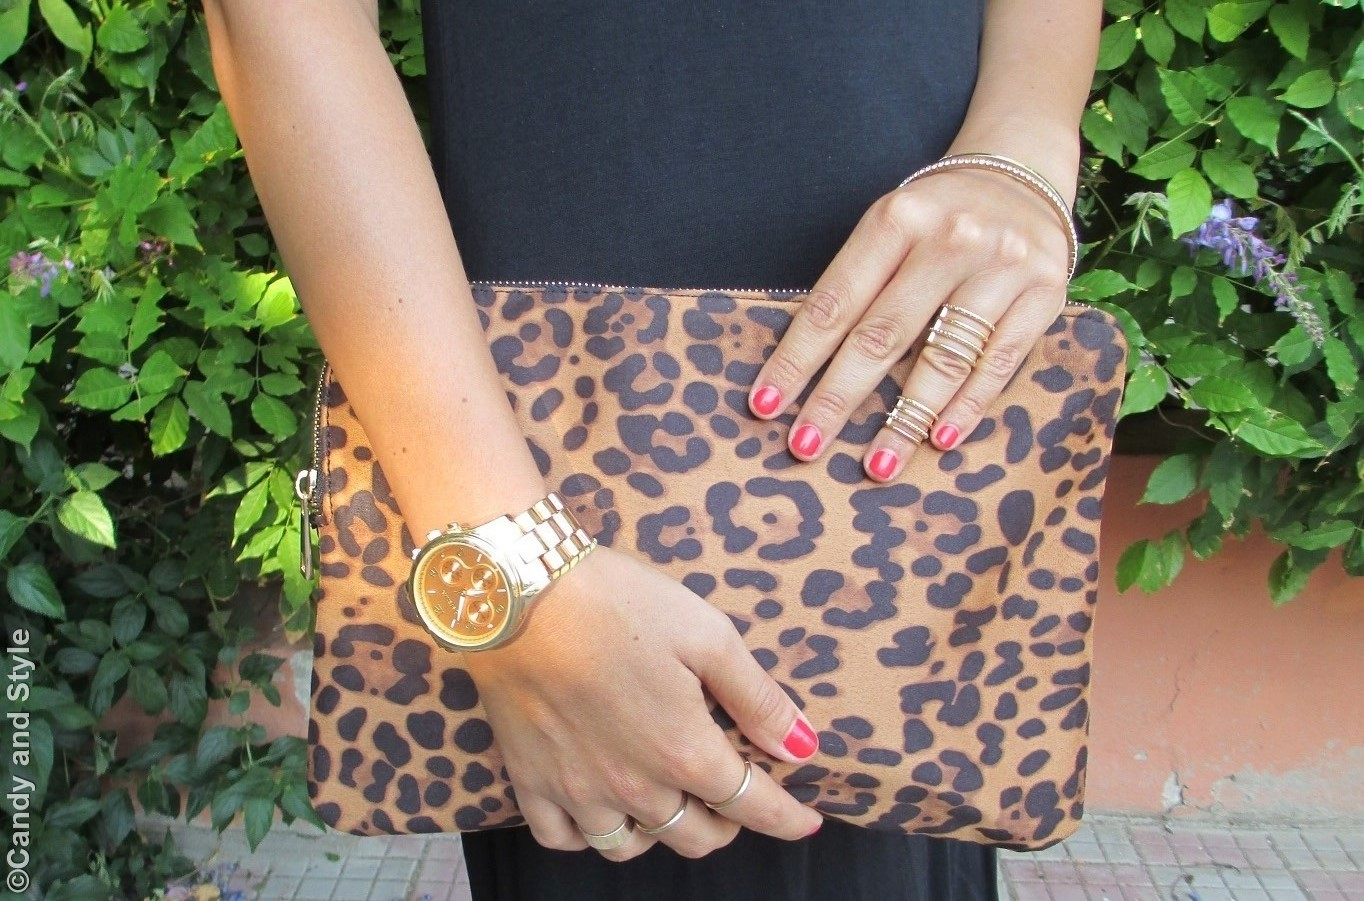 Leopard Clutch, Accessories - Details